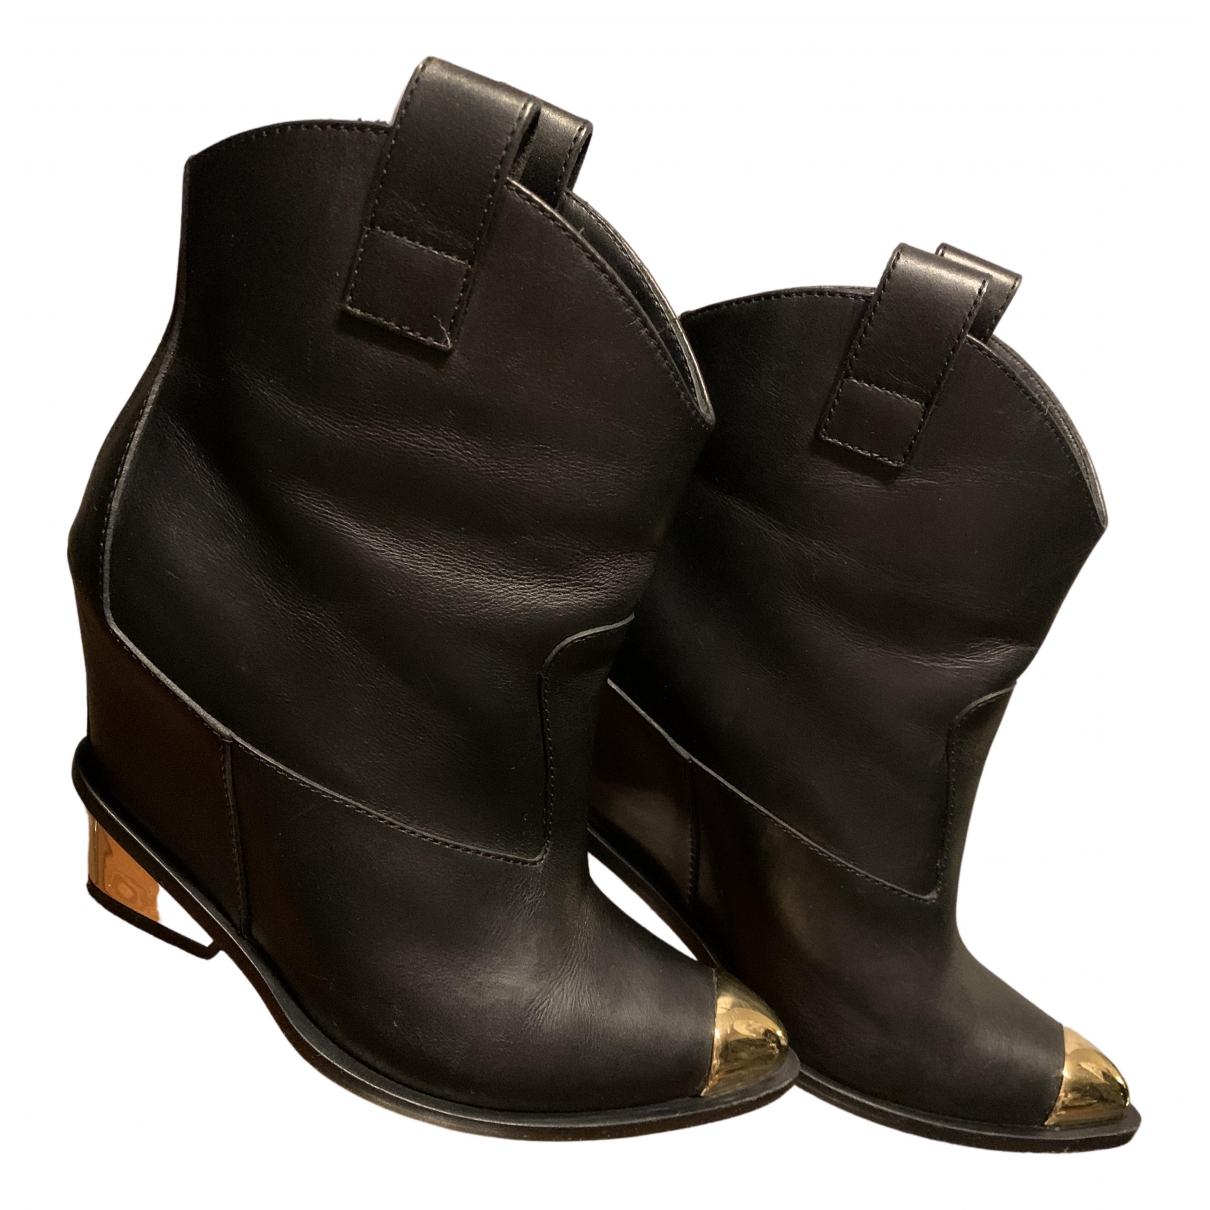 Giuseppe Zanotti N Black Leather Boots for Women 37.5 EU